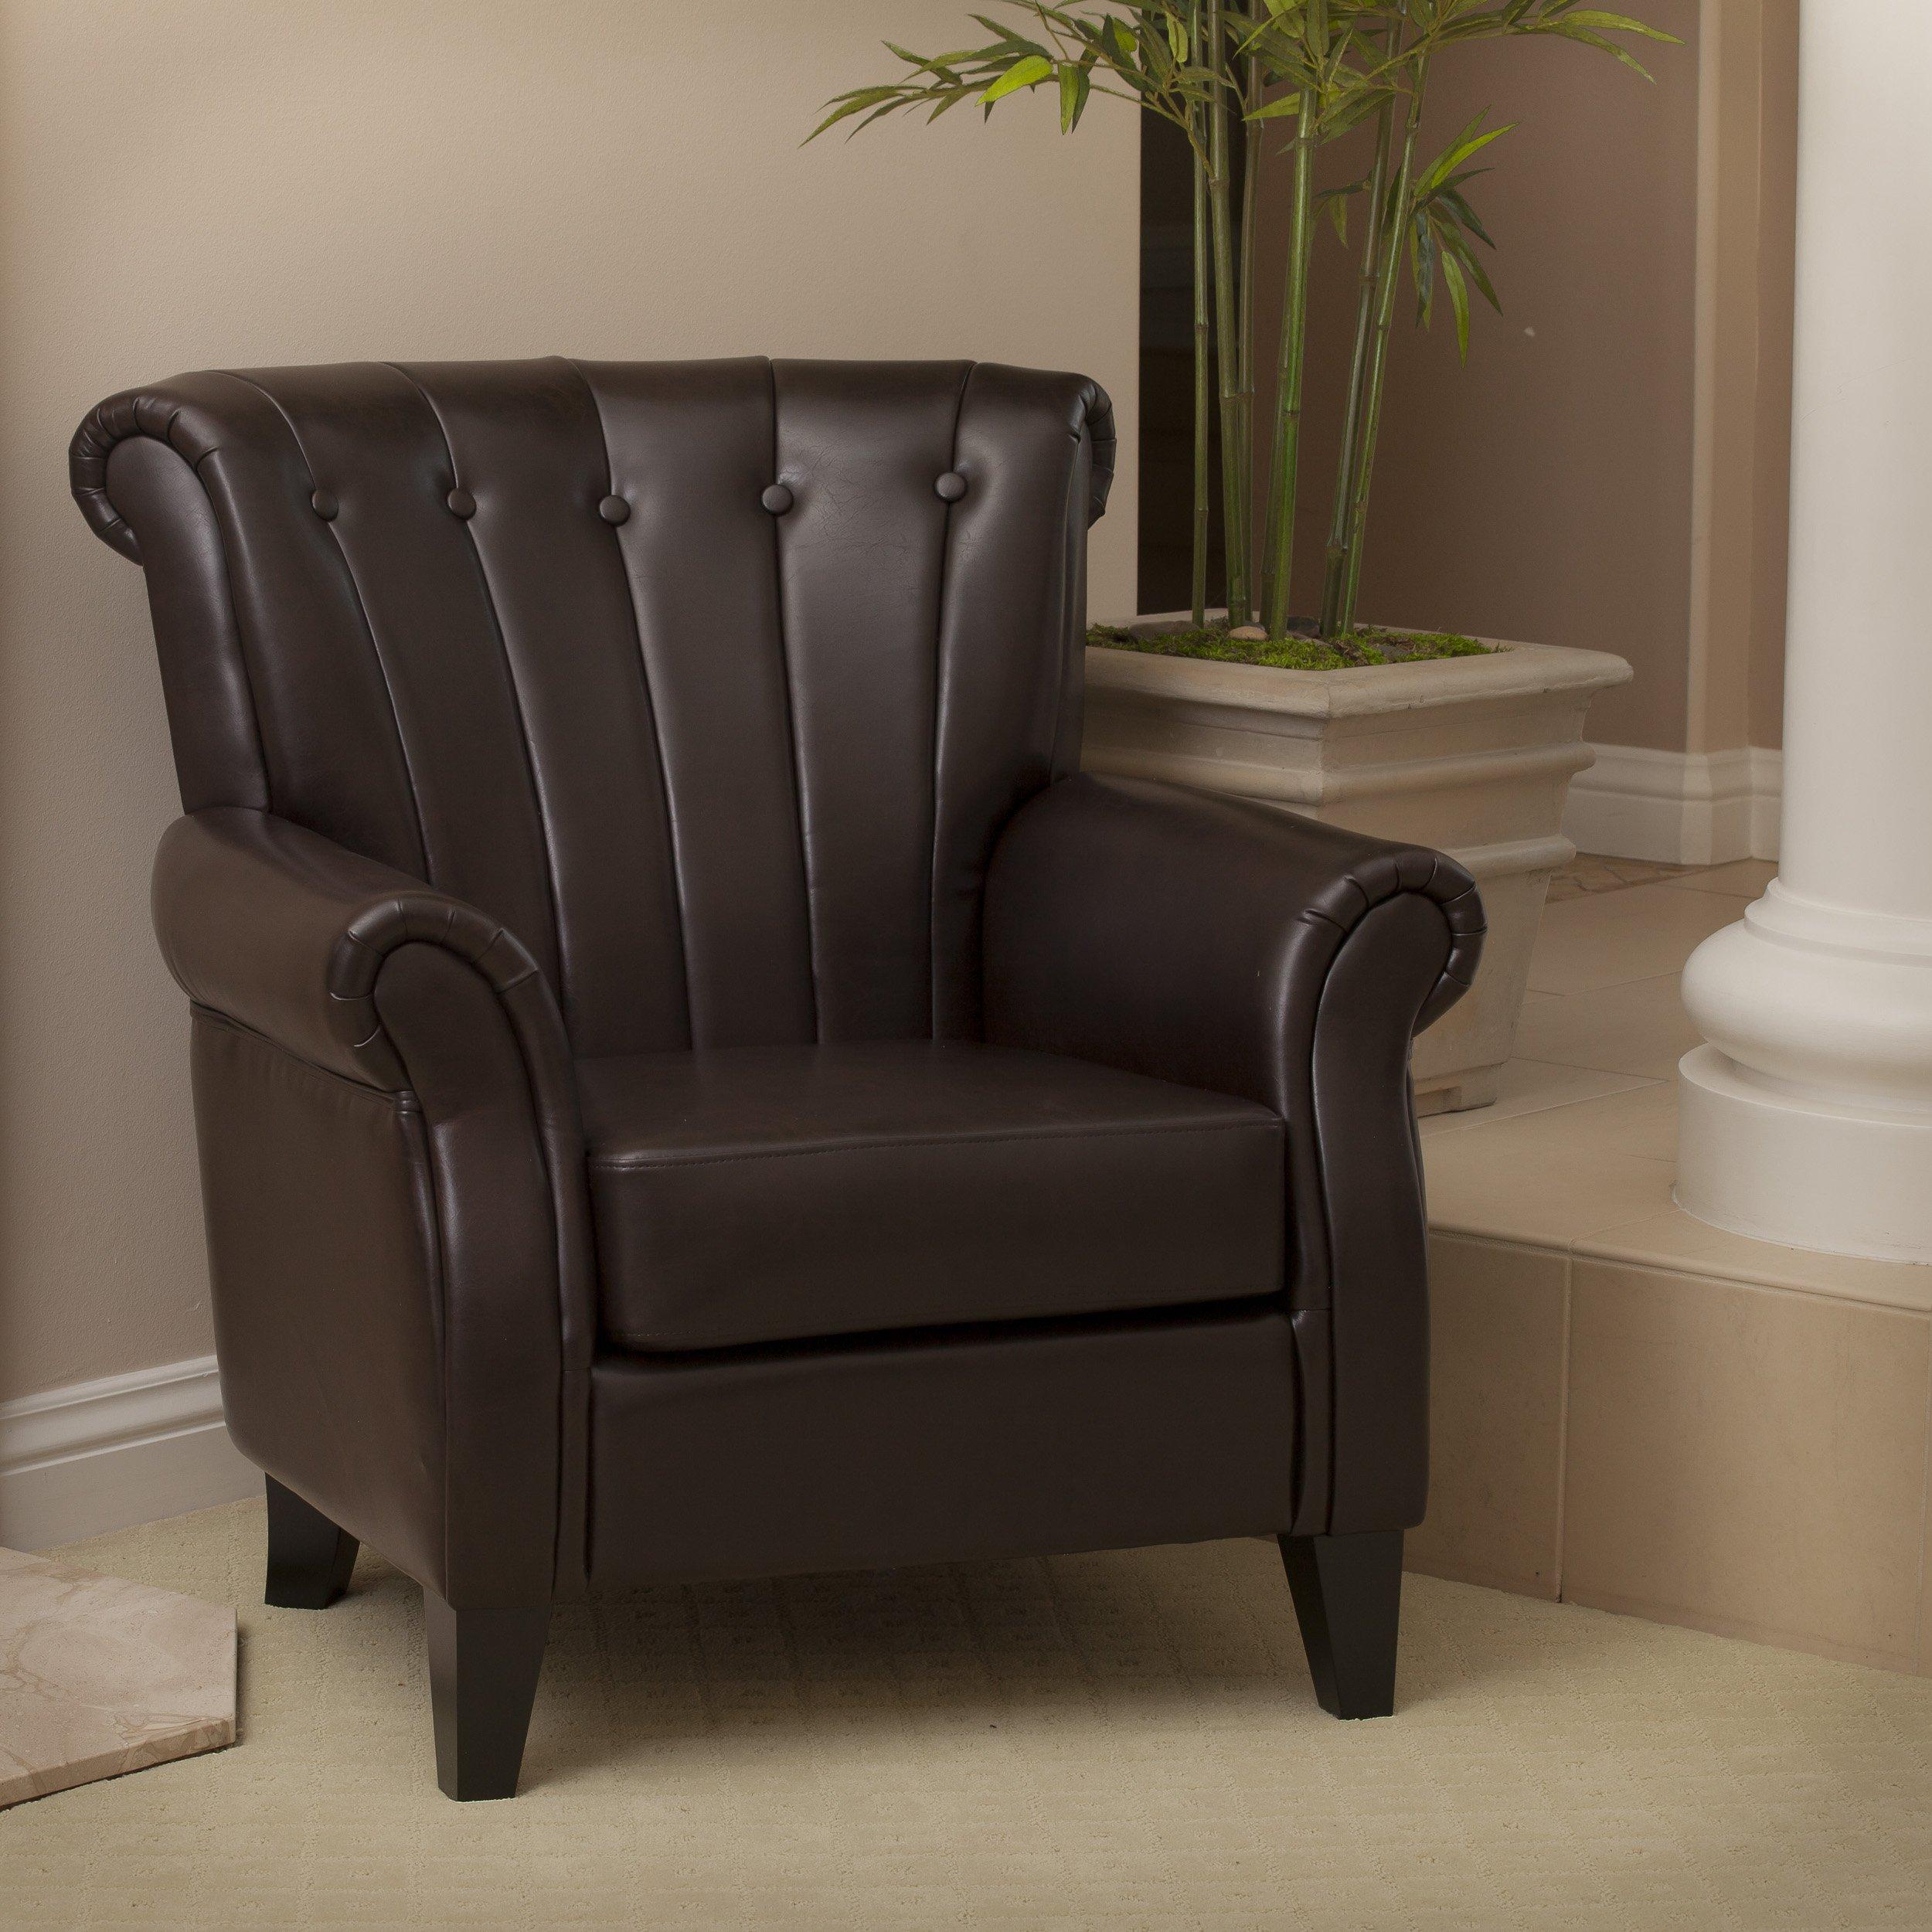 Best Deals On Living Room Furniture: Best Rated In Living Room Furniture & Helpful Customer